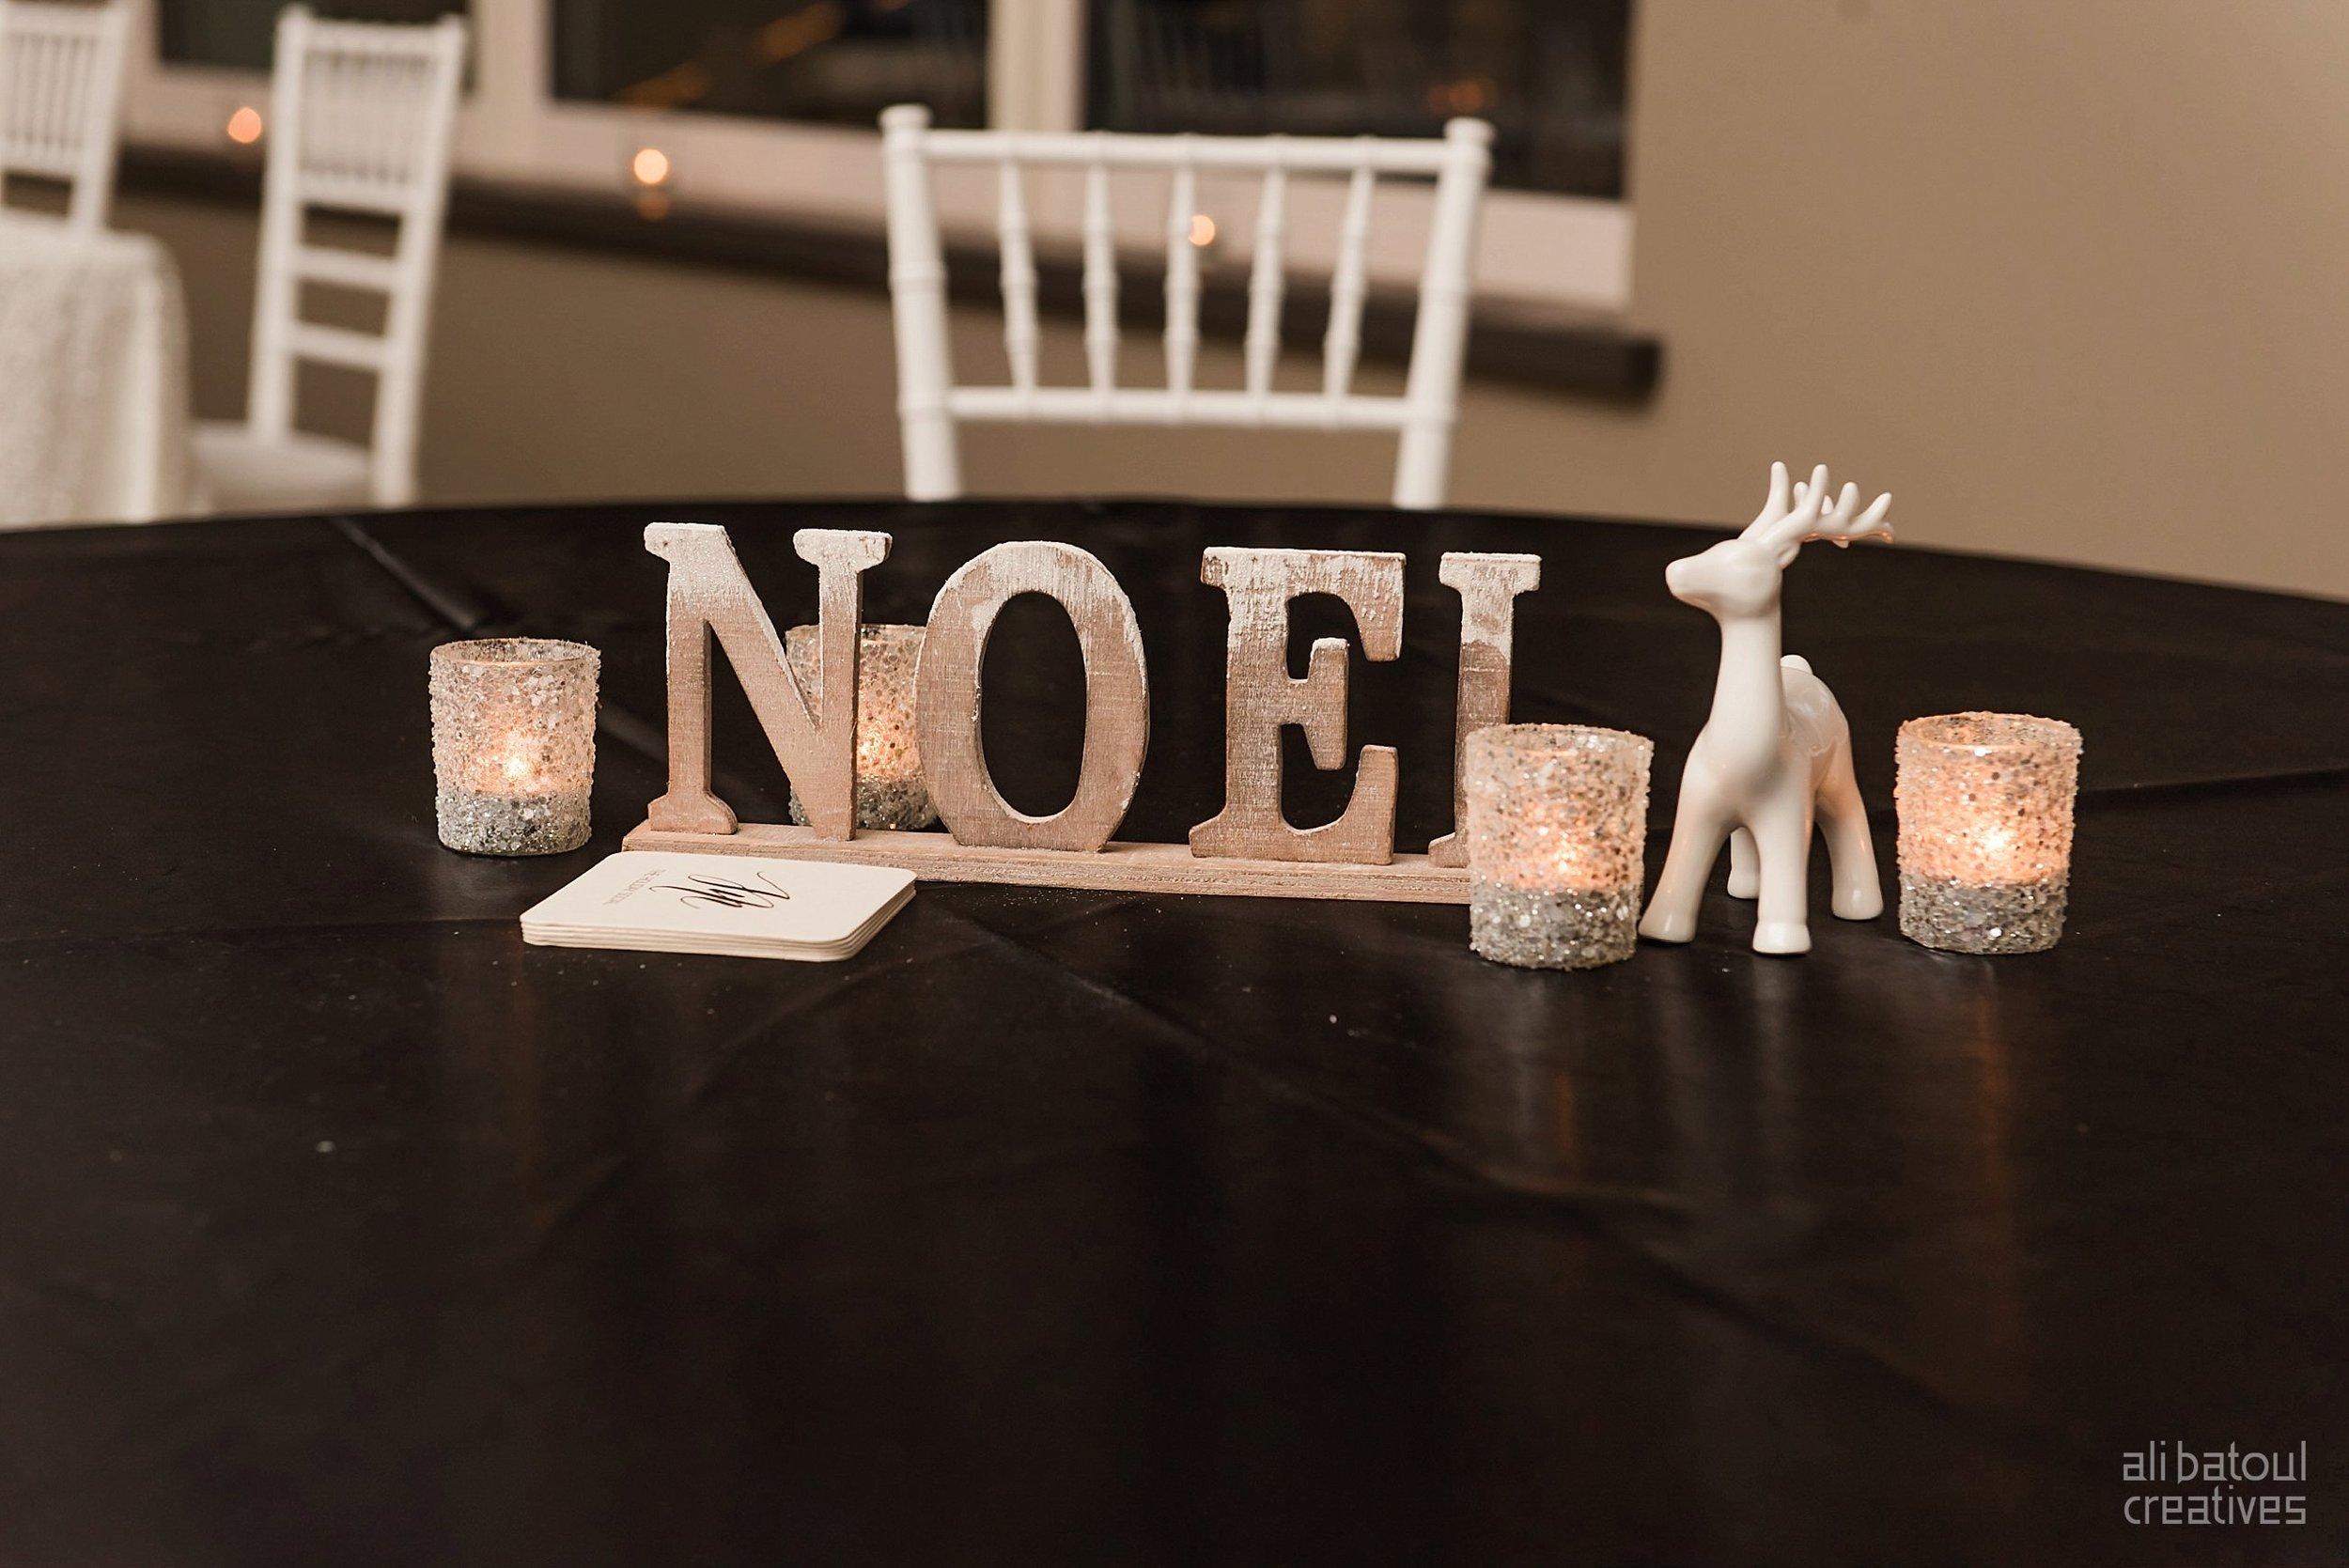 Noel en Noir BLOG - Ali Batoul Creatives_-22_Stomped.jpg